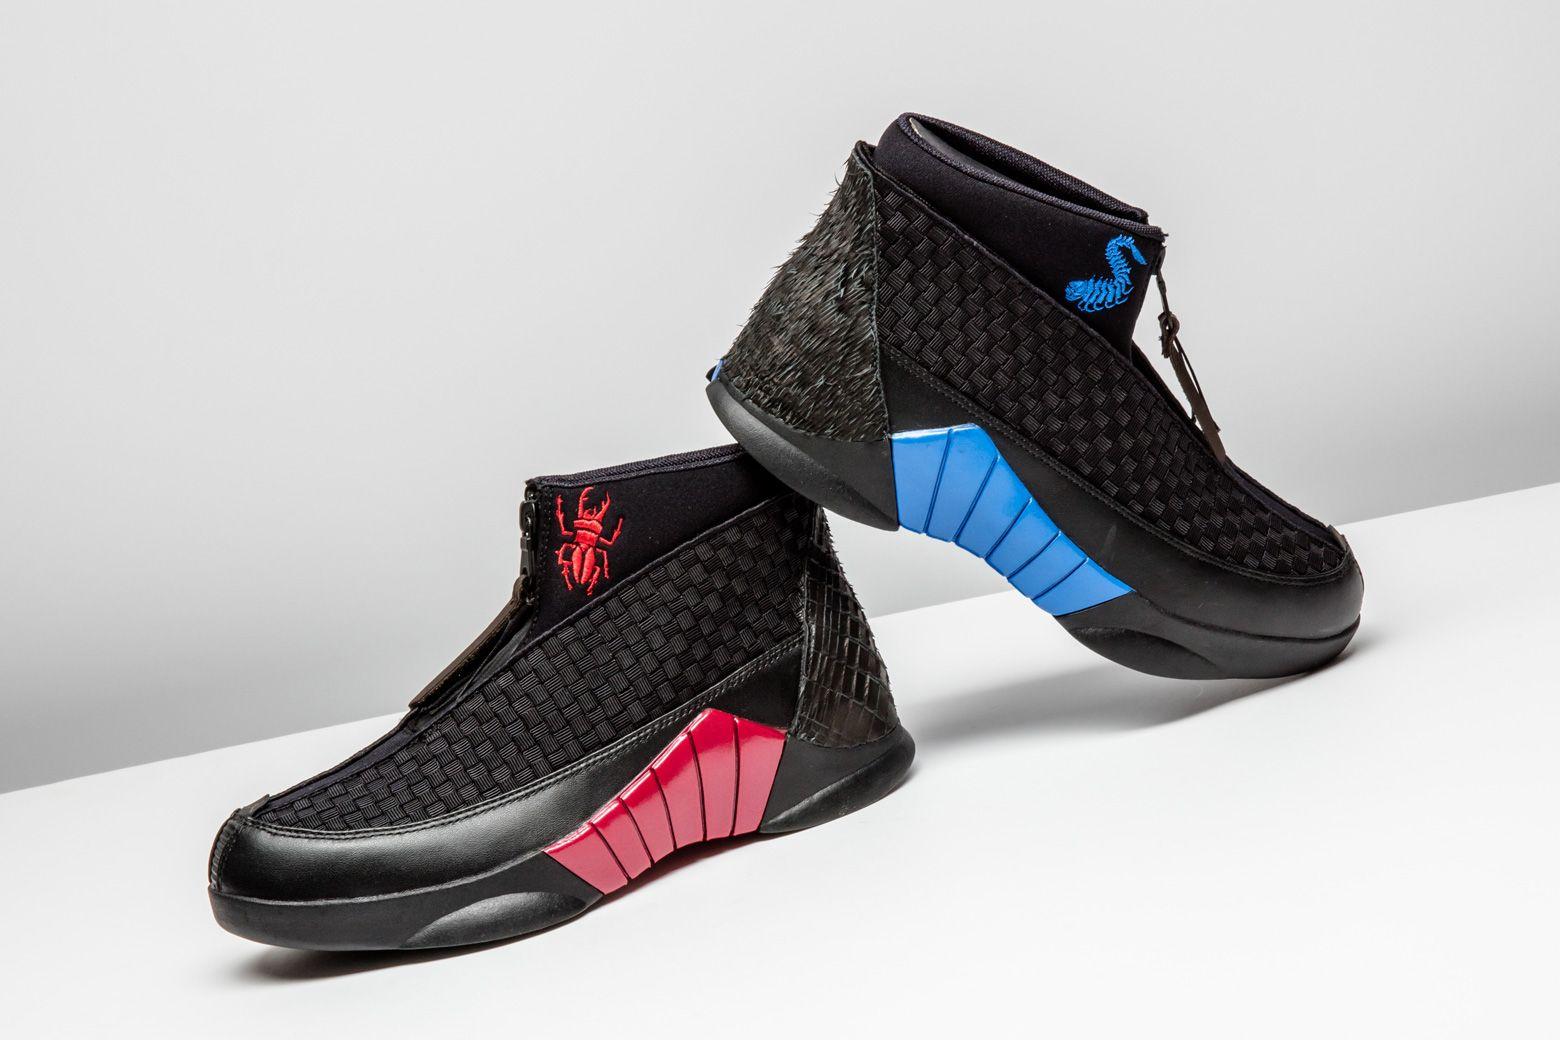 8d8dbc092eb Air Jordan 15 x Kubo Black/Red 'Laika Kubo' | Air Jordan | Air ...